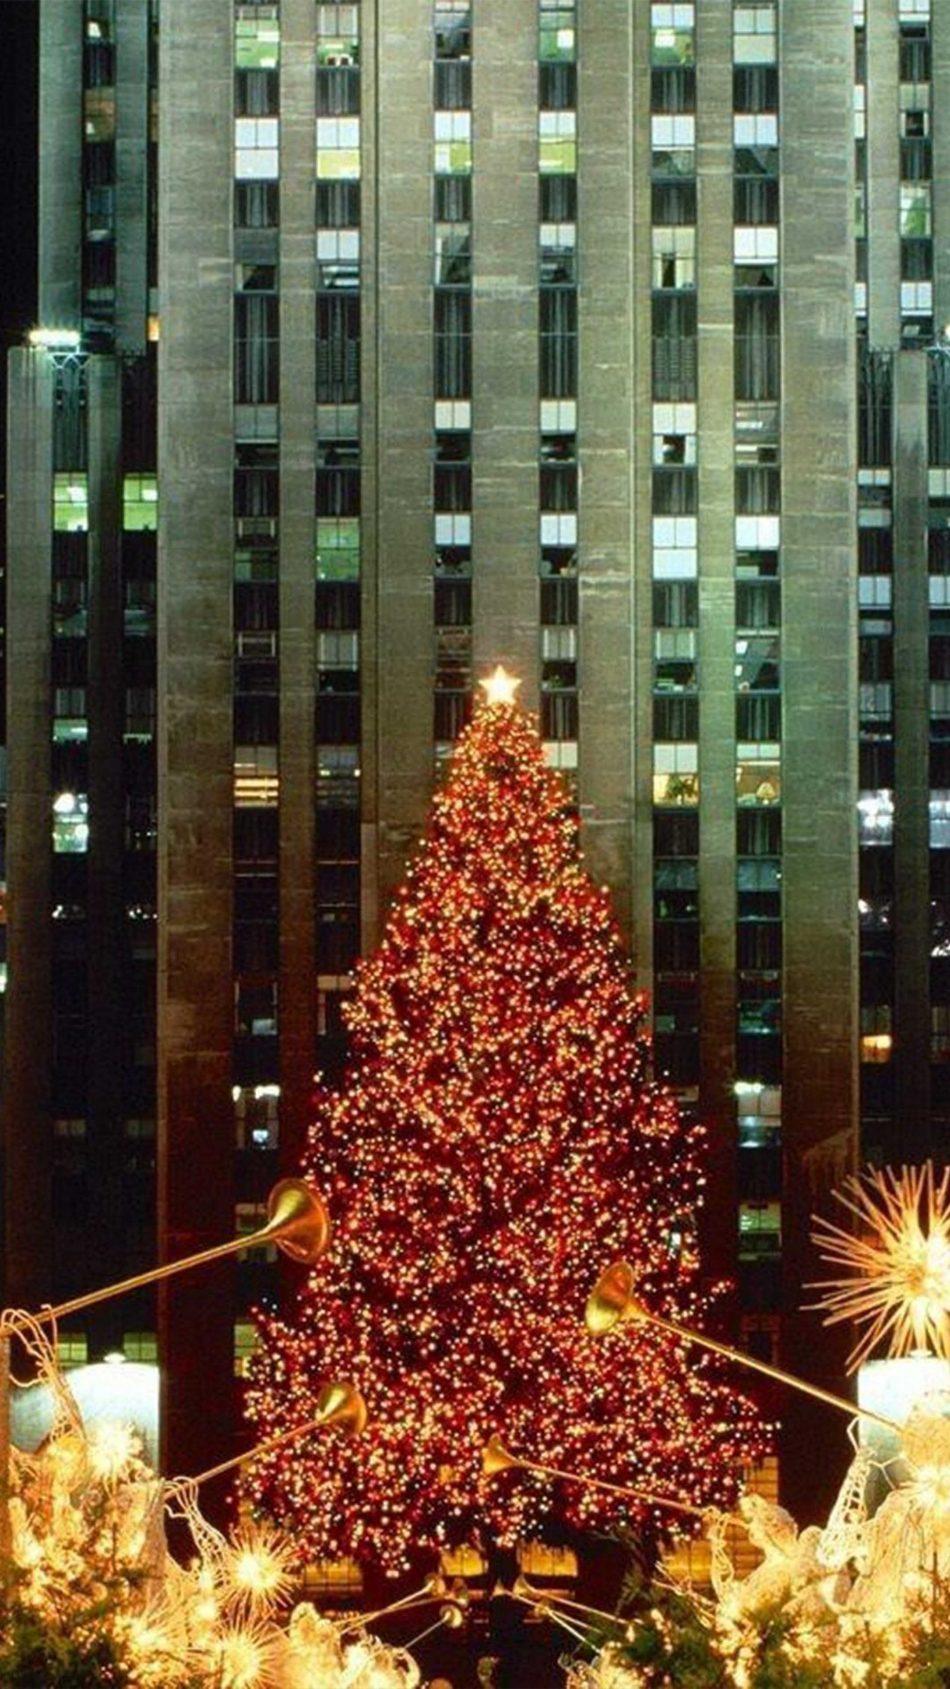 Christmas Tree Lights City Festival 4K Ultra HD Mobile Wallpaper